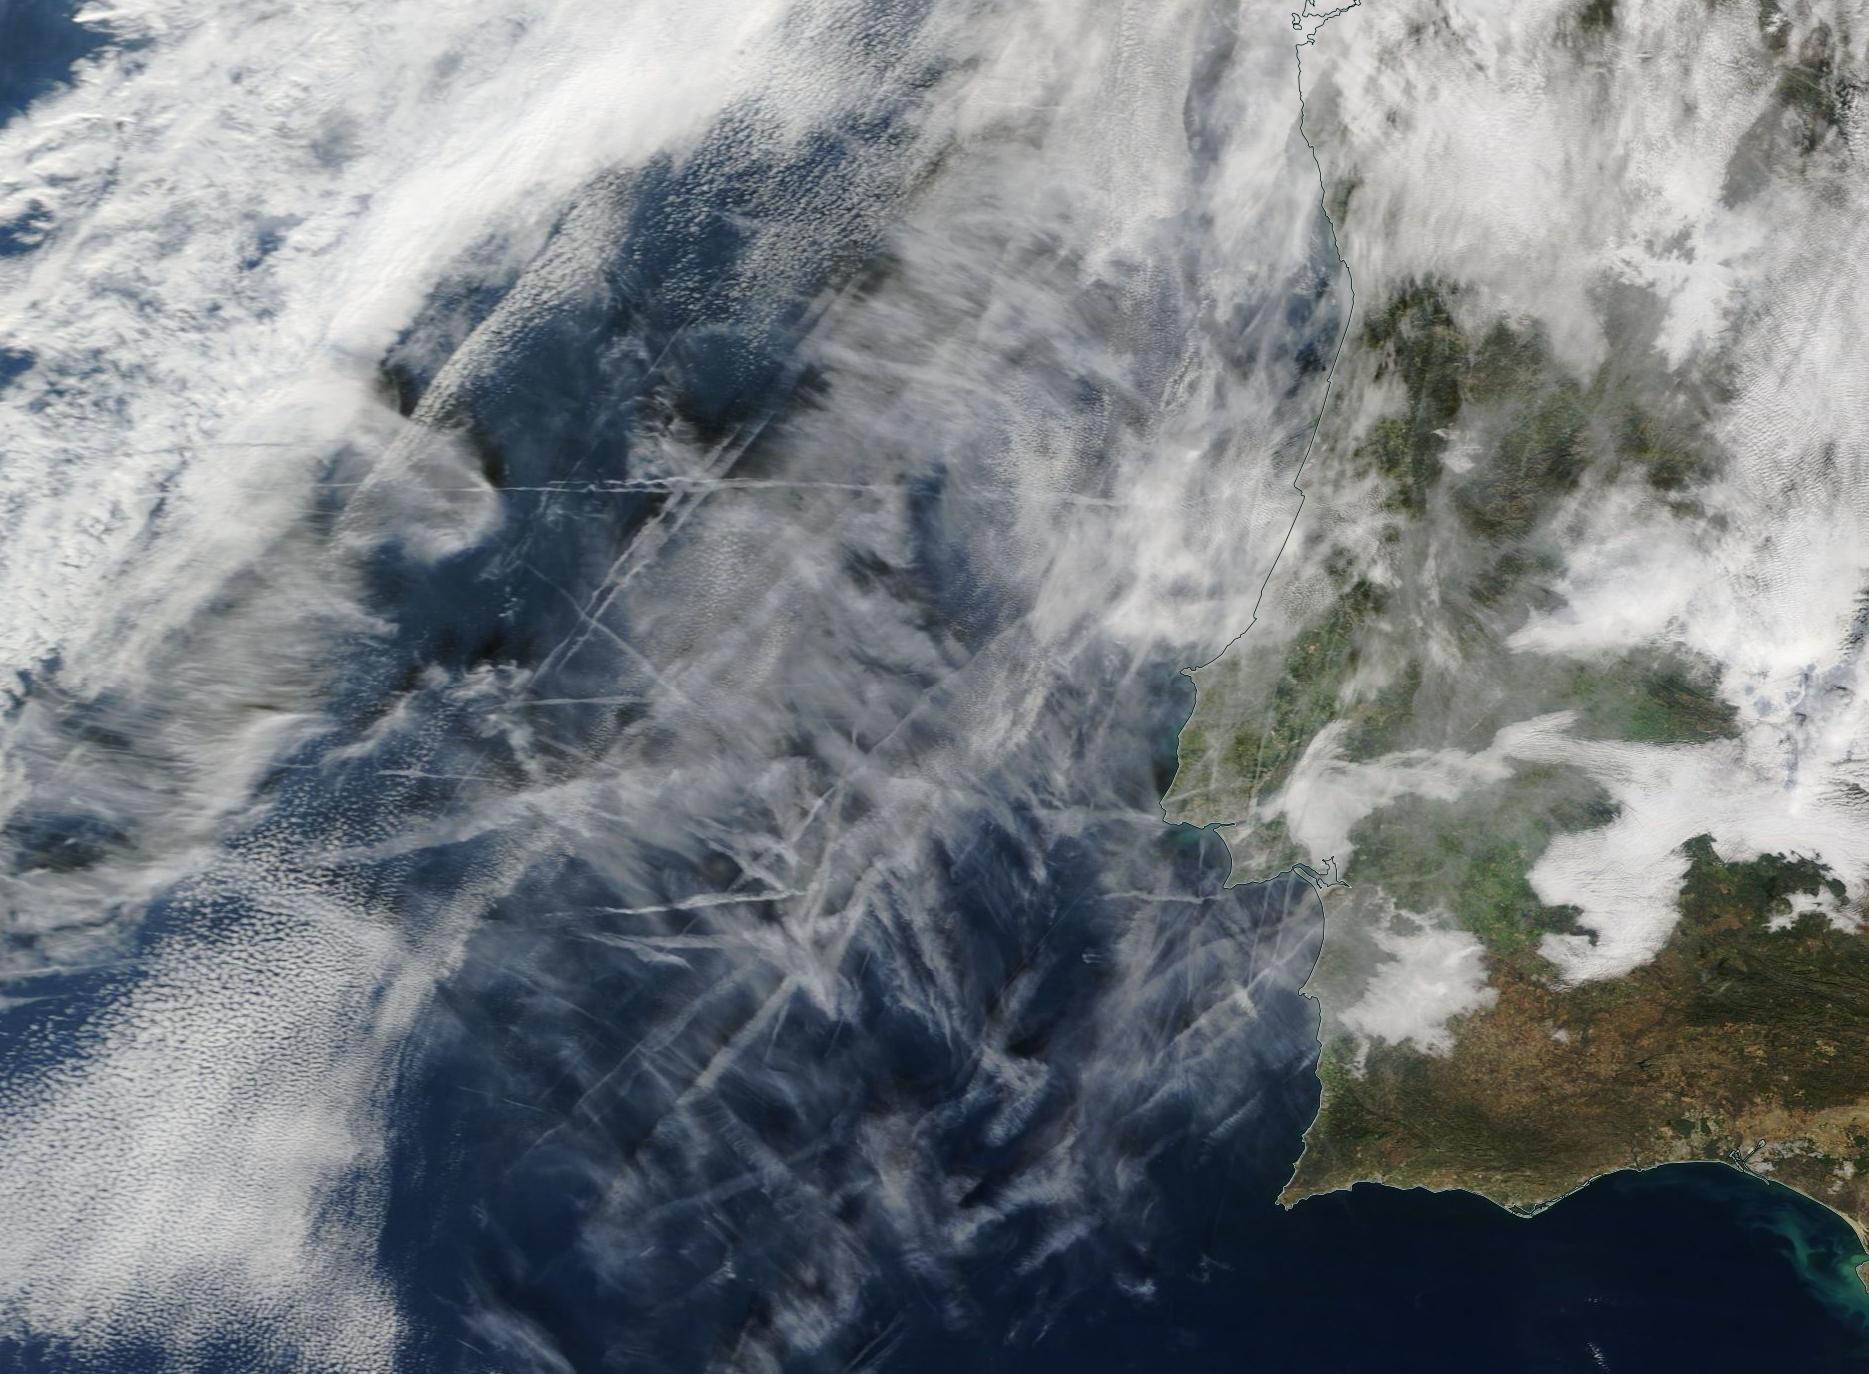 Lisbon, Portugal chemtrails geoengineering 10 Dec 2019 ... https://go.nasa.gov/2YzsVPc